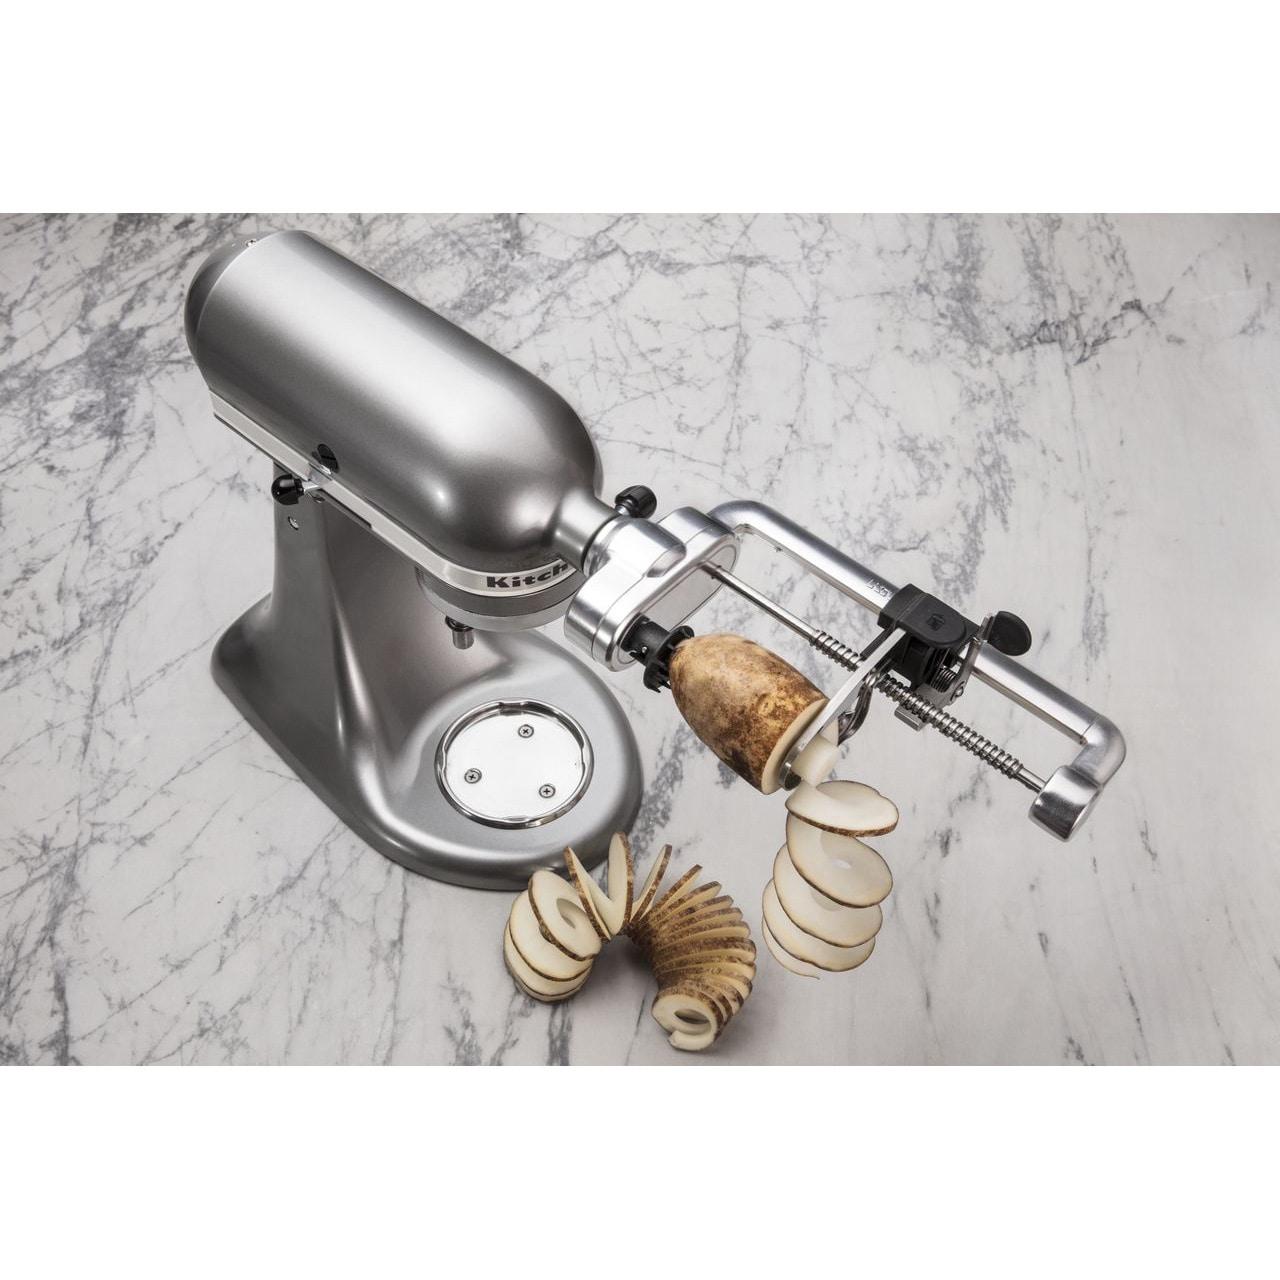 Shop Kitchenaid Ksm1apc Spiralizer Attachment Free Shipping Today